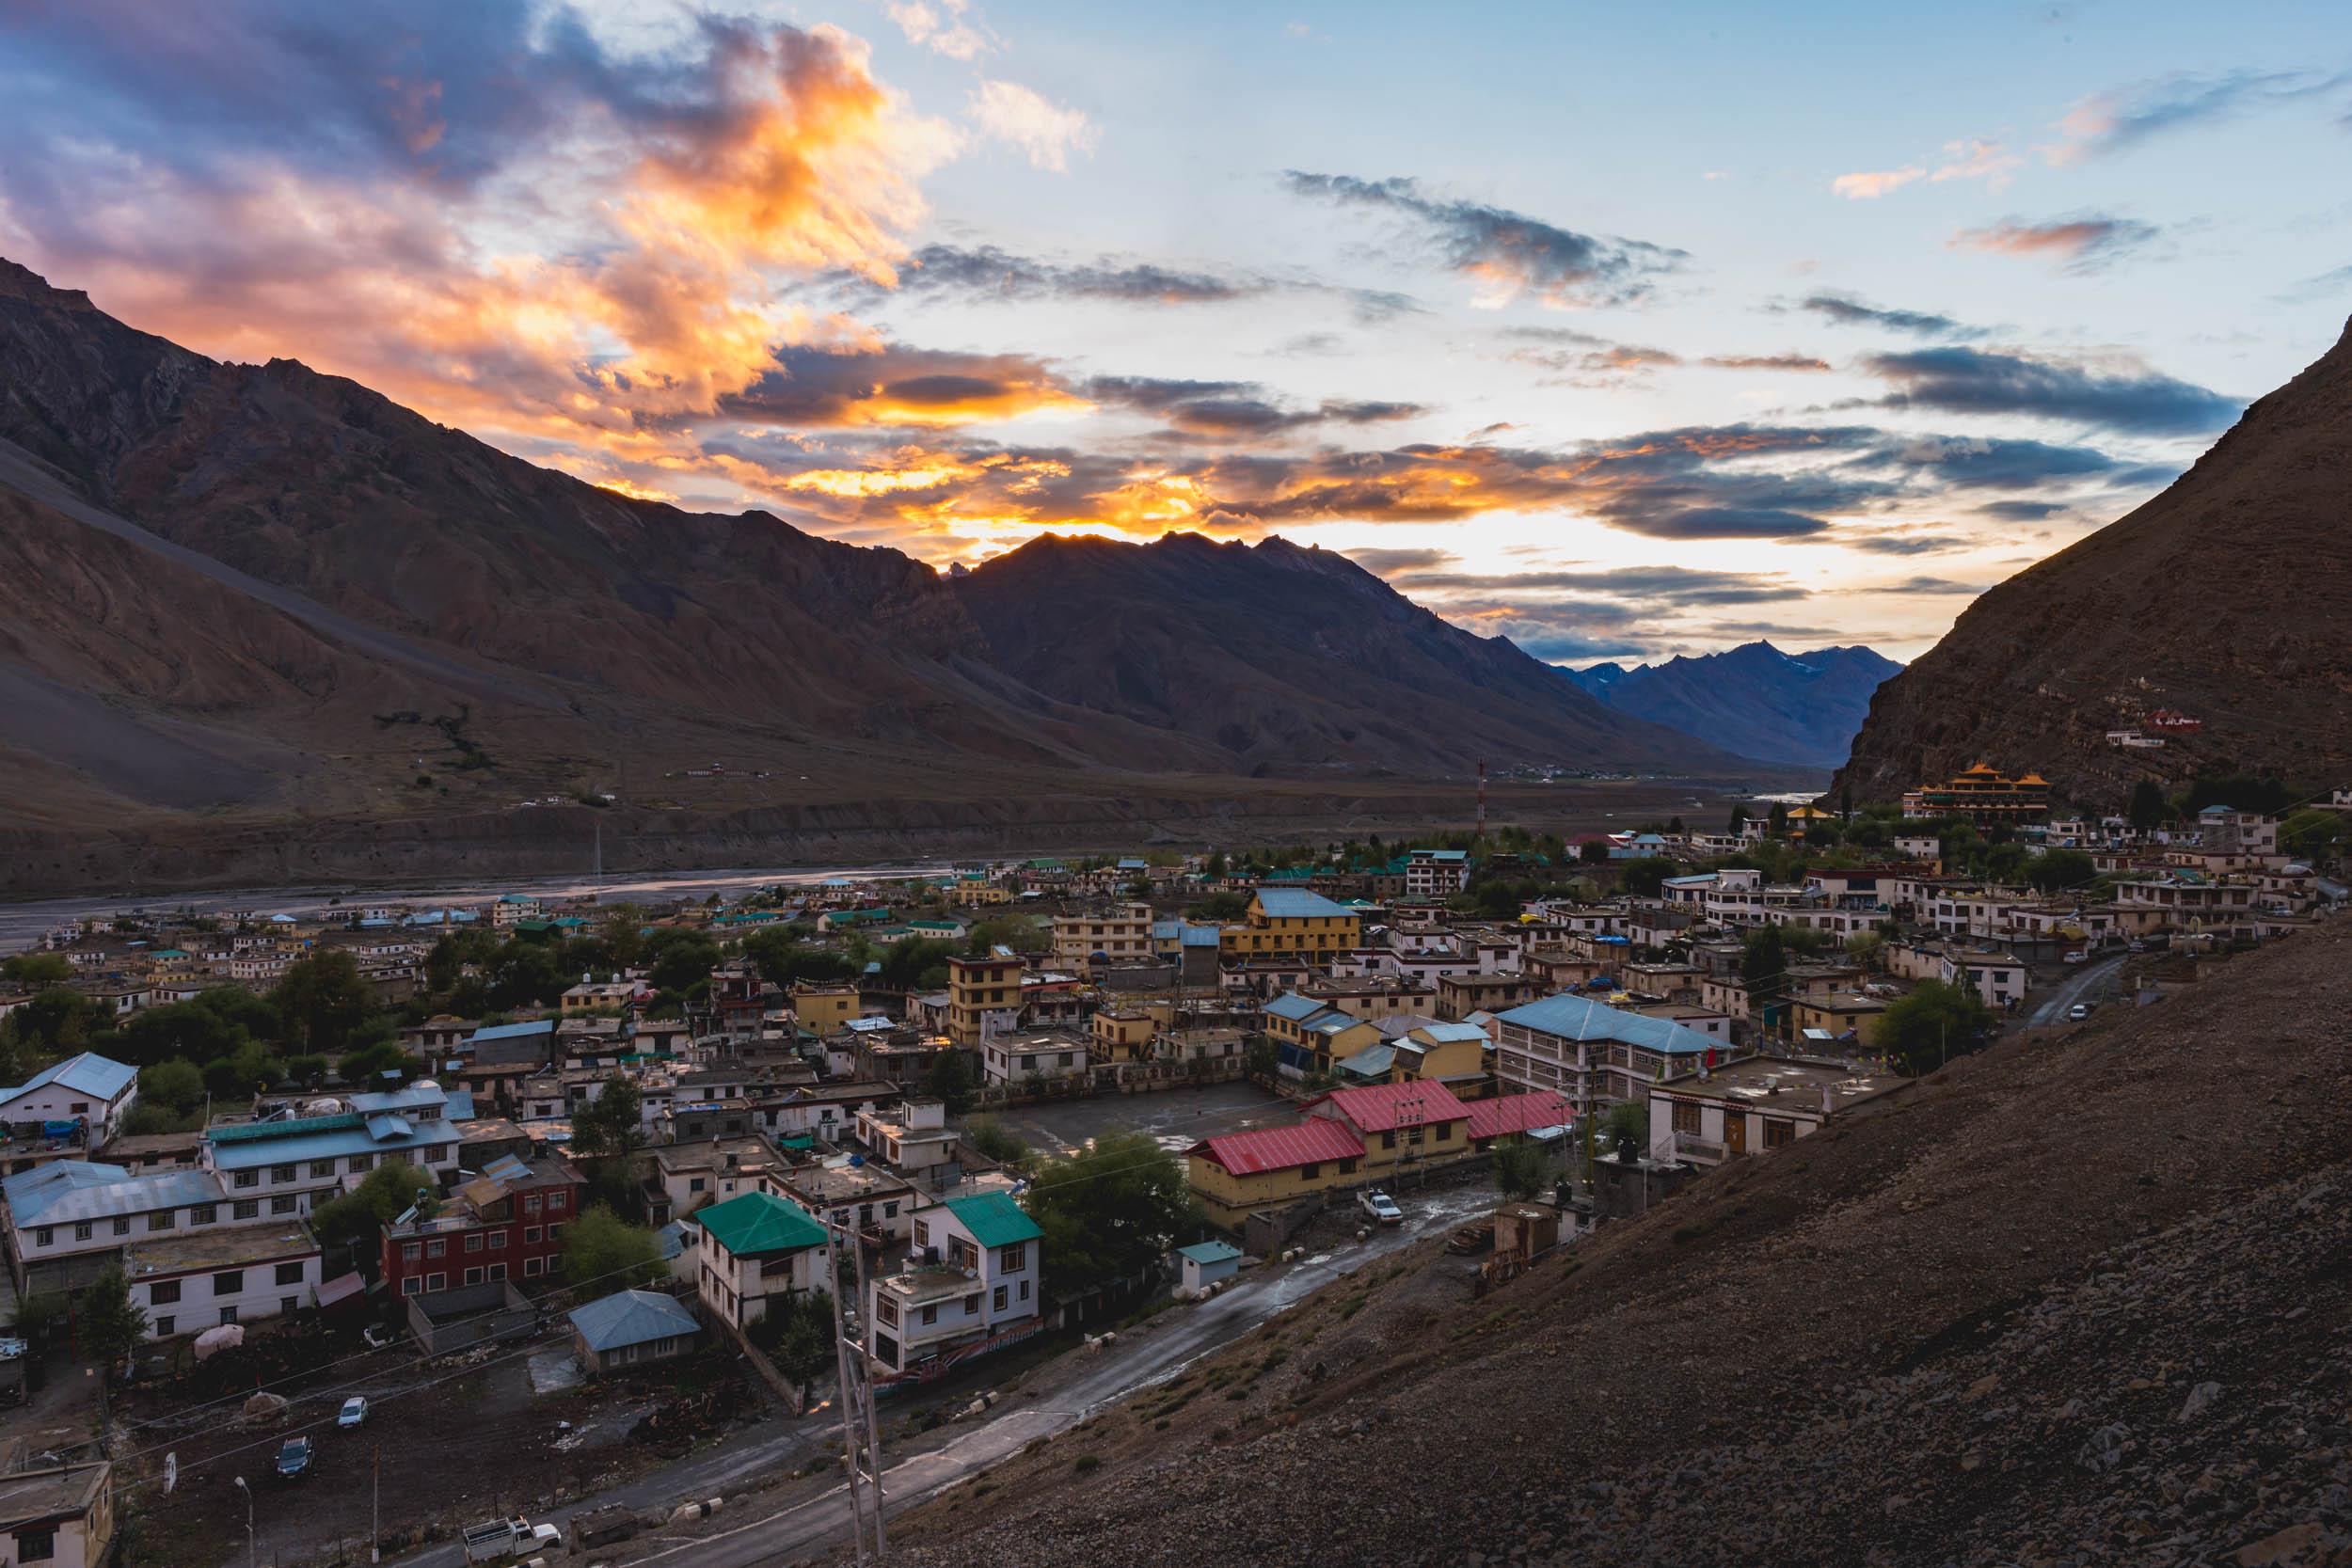 Kaza, Spiti Valley Sunset